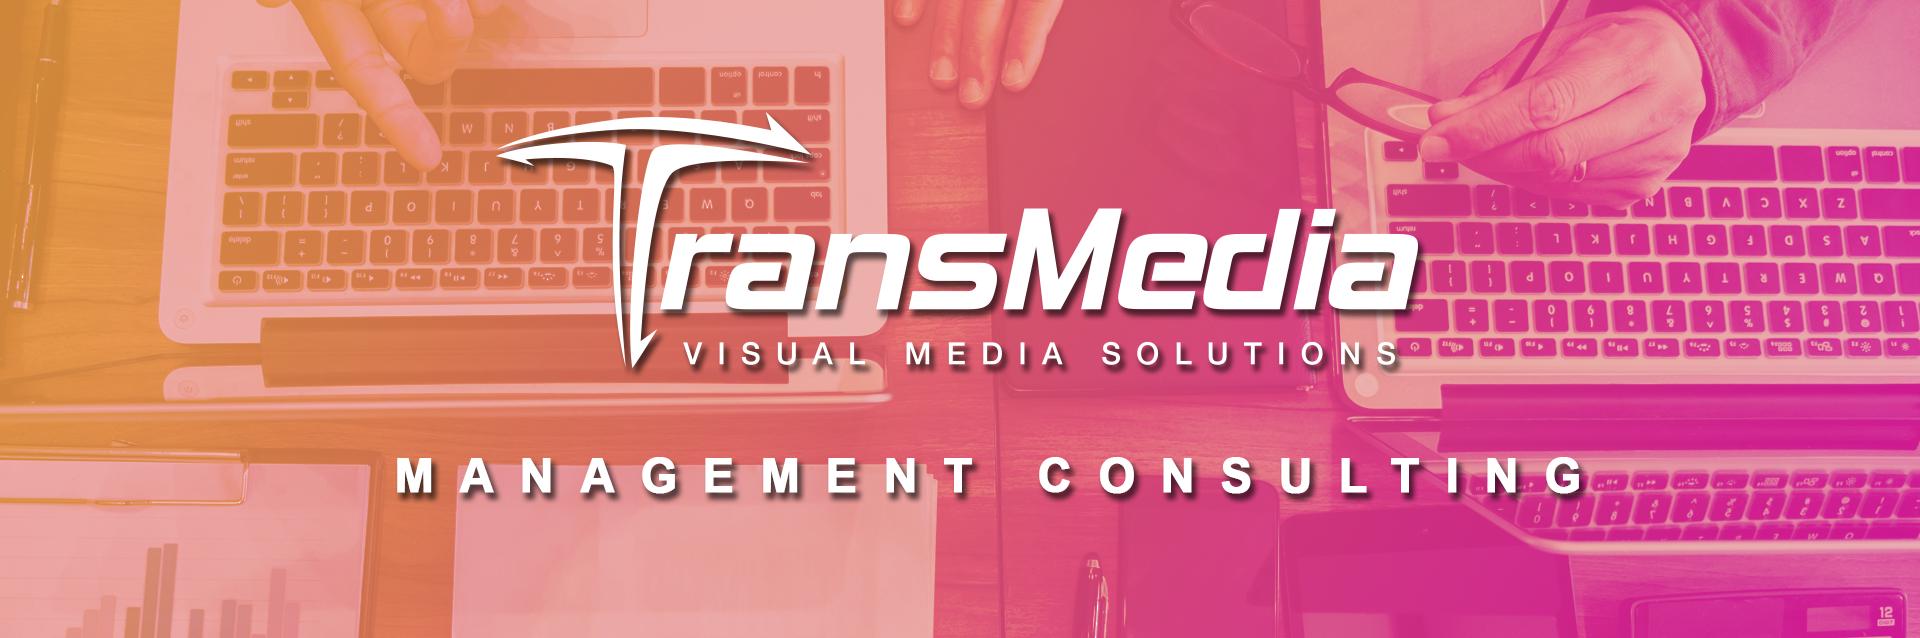 TransMedia Top Banner